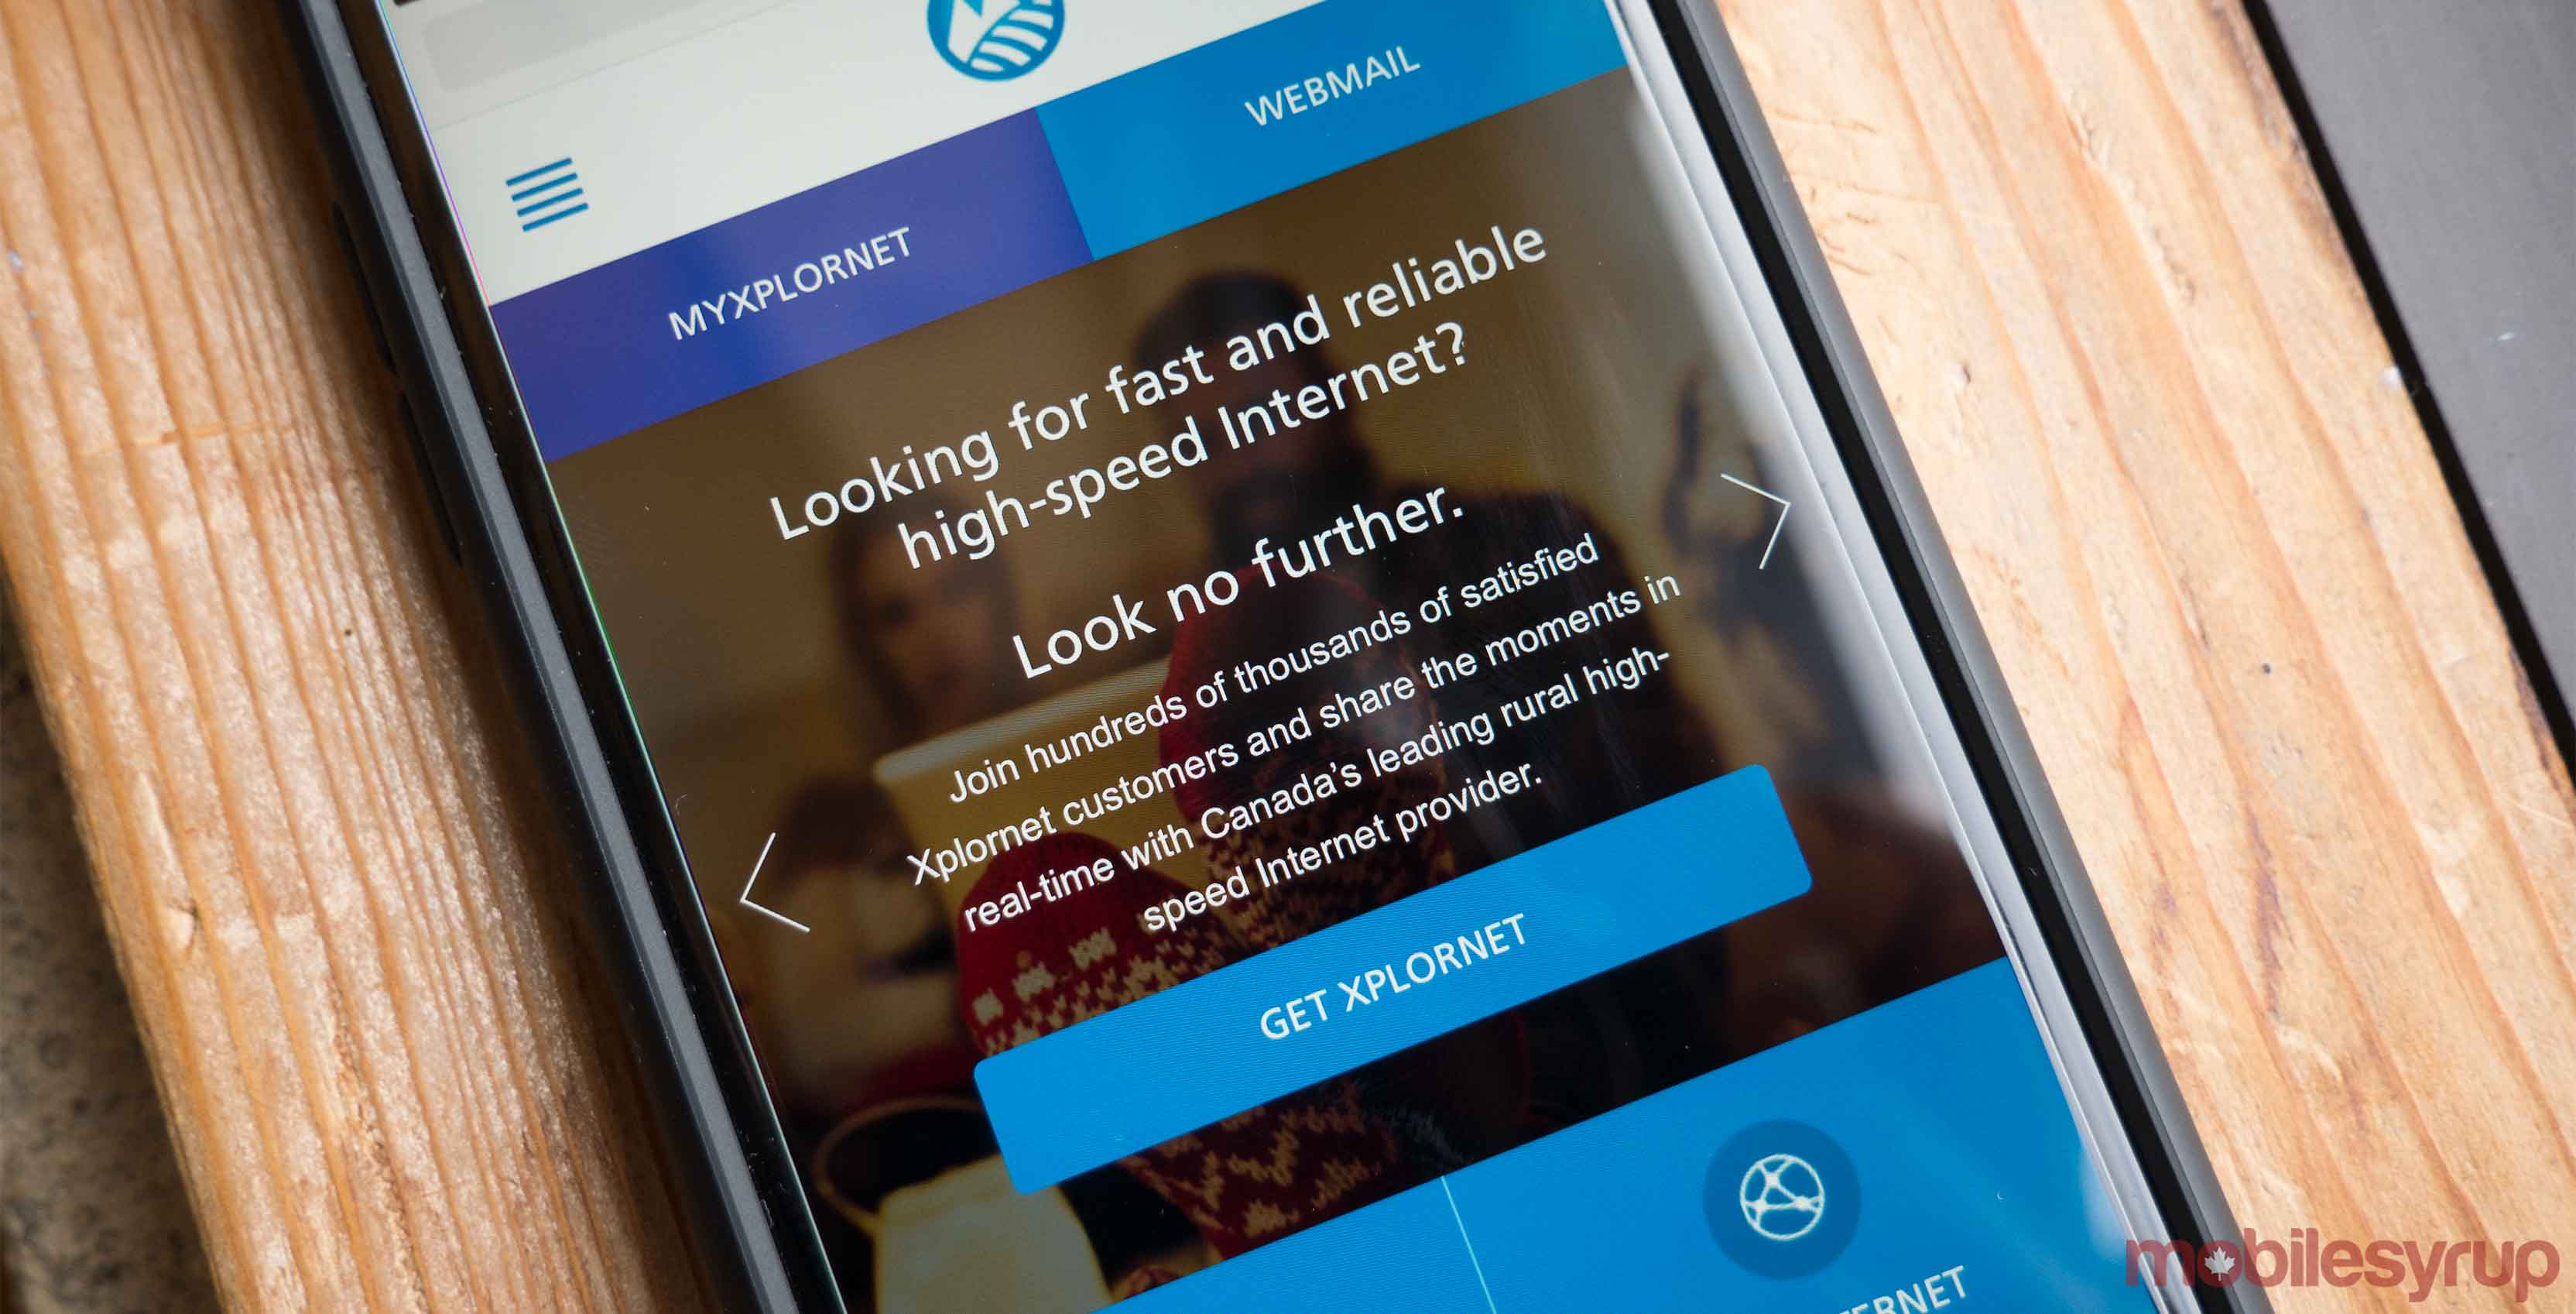 Xplornet LTE Network website on a phone